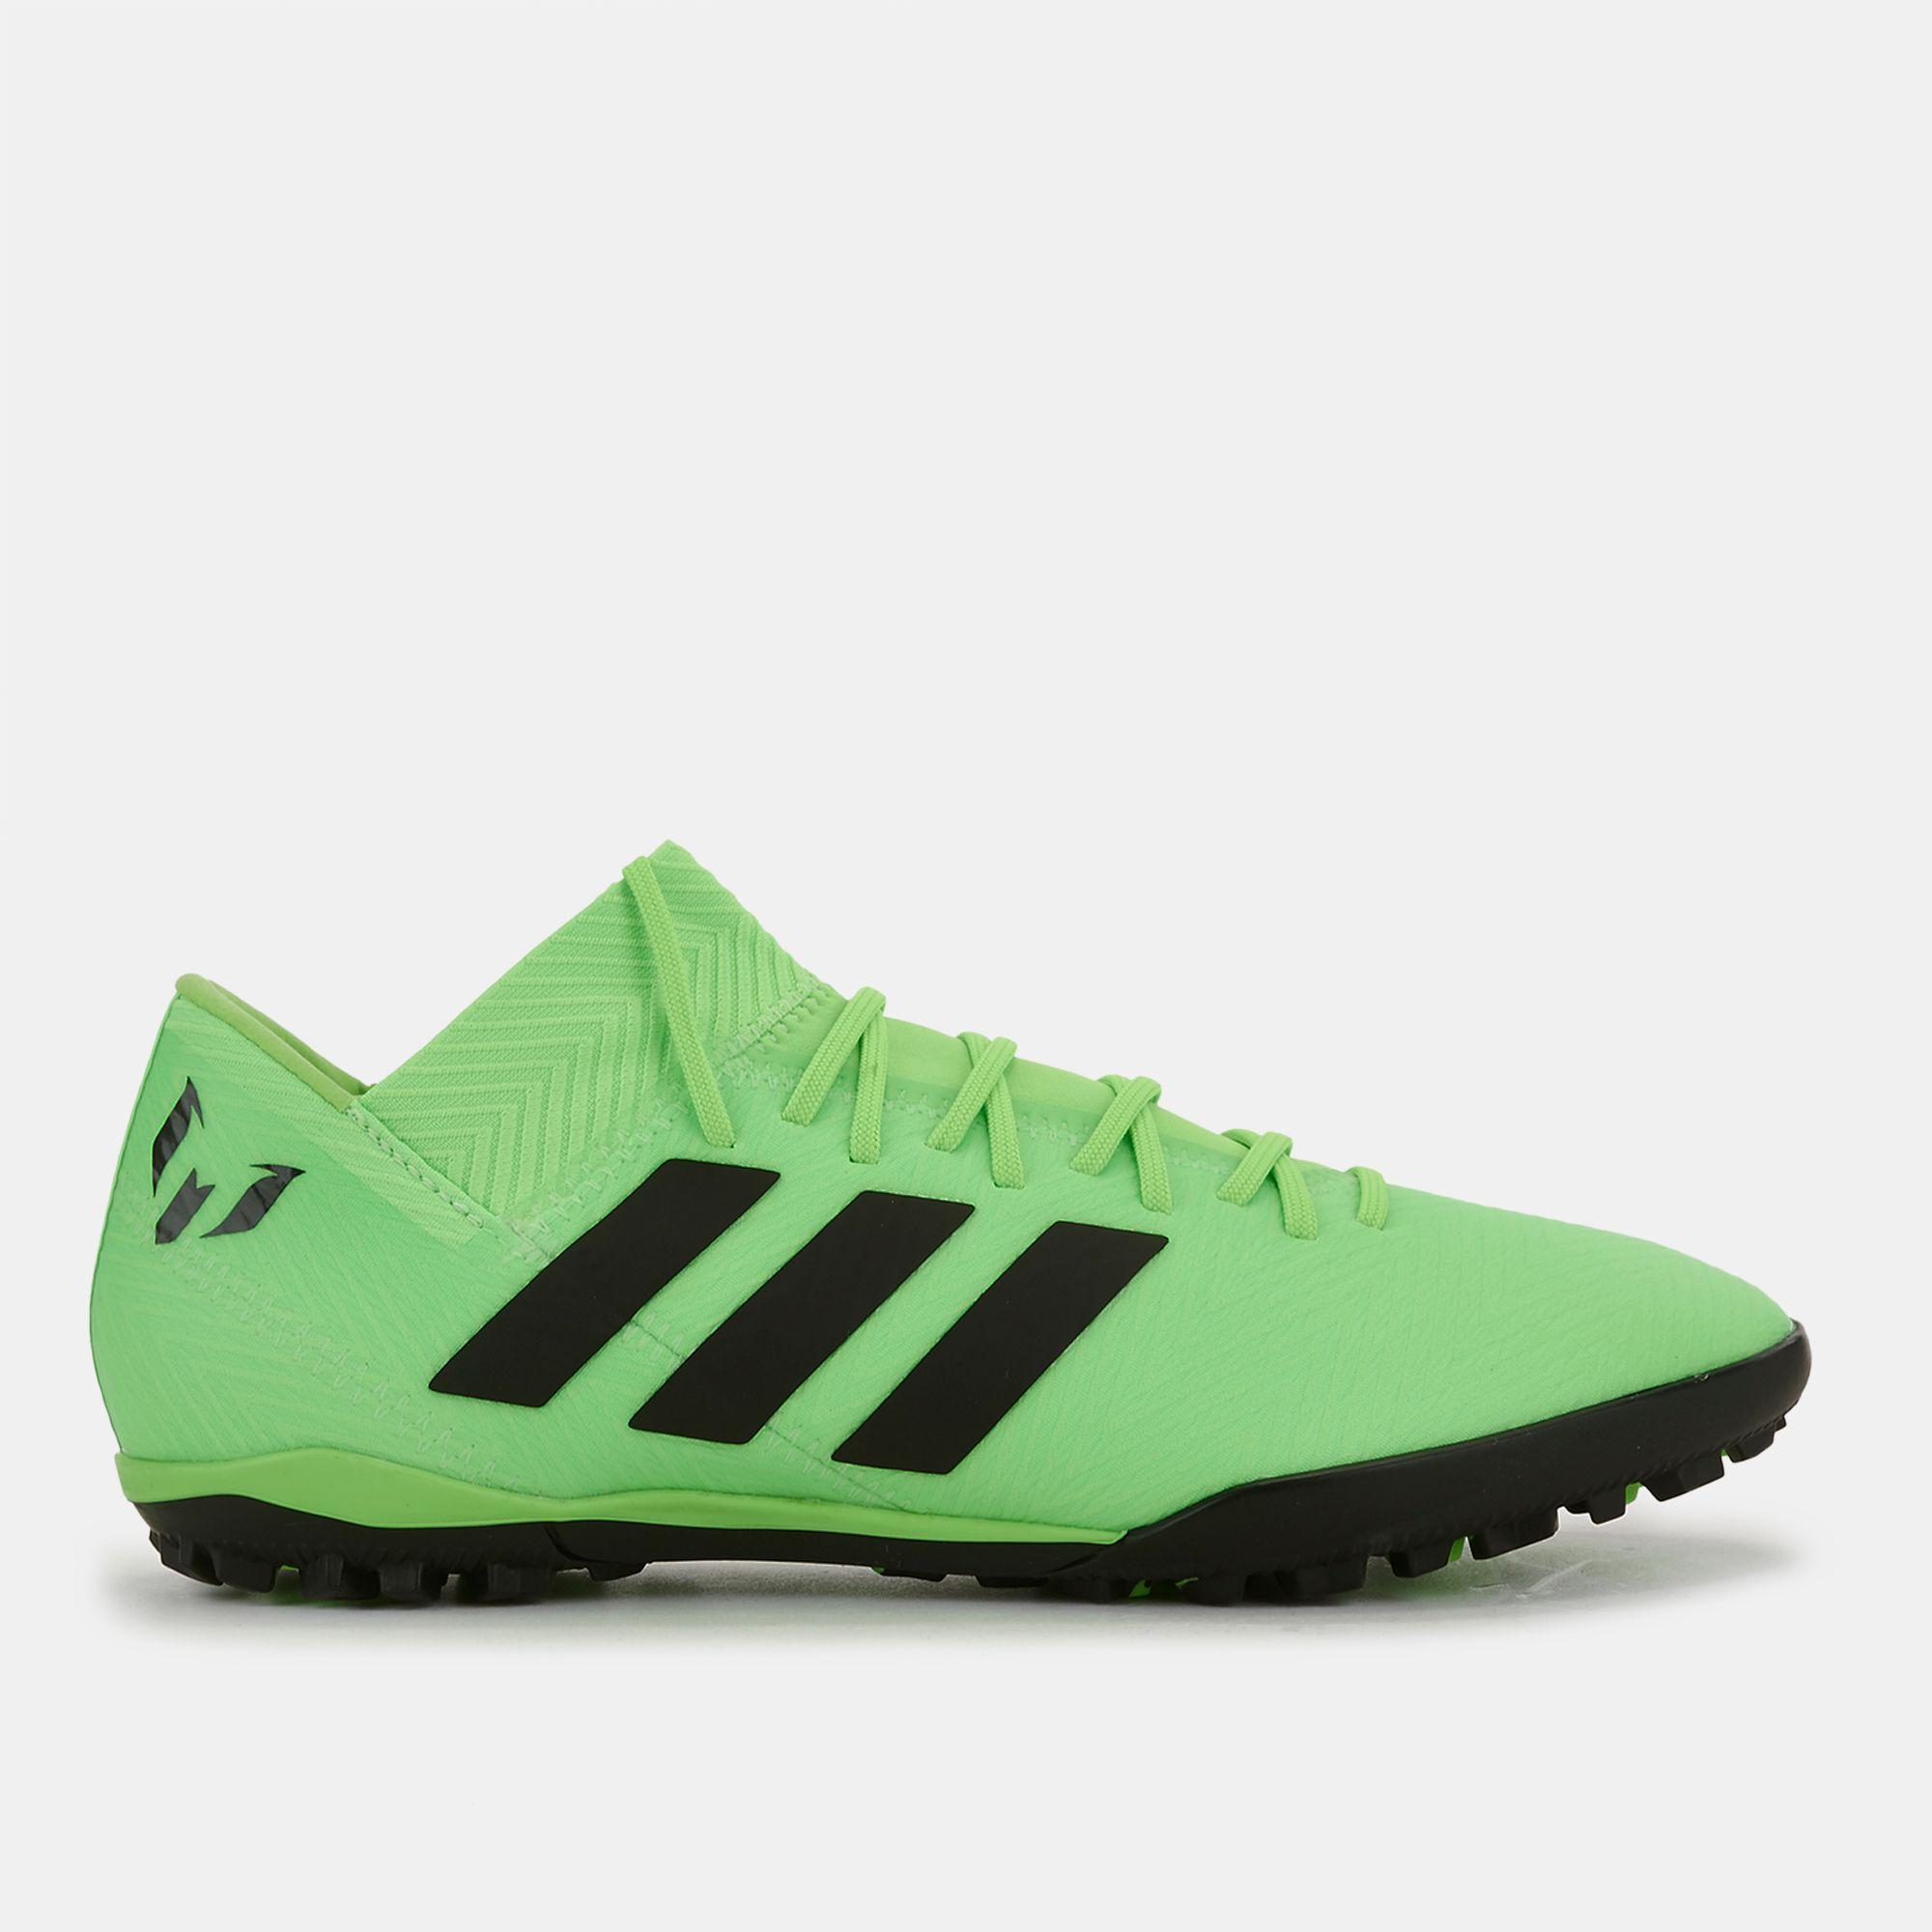 e259a66f7a71 adidas Nemeziz Messi Tango 18.3 Turf Football Shoe | Football Shoes ...